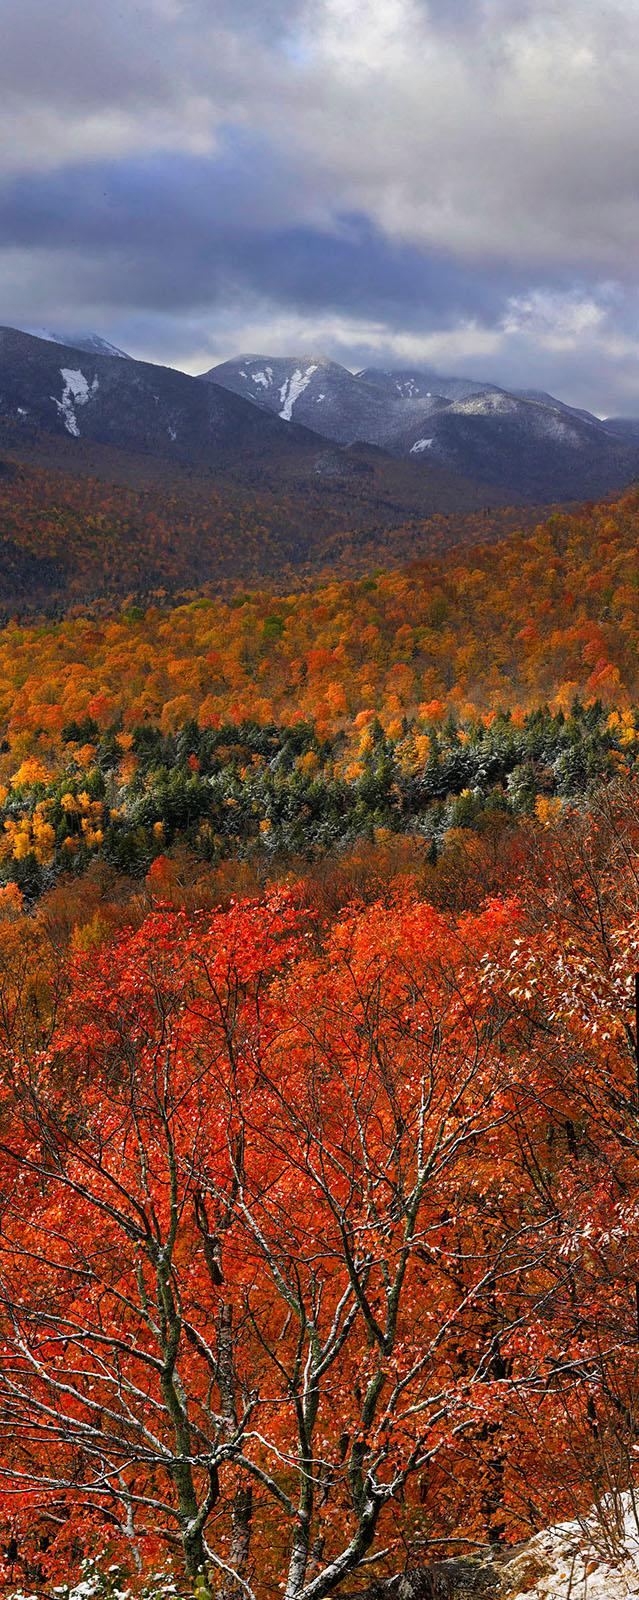 Adriens Acres,vertical panorama,snow,autumn snowfall,snowfall,autumn,dusting,October,Johns Brook Valley,Great Range,Keene Valley, photo